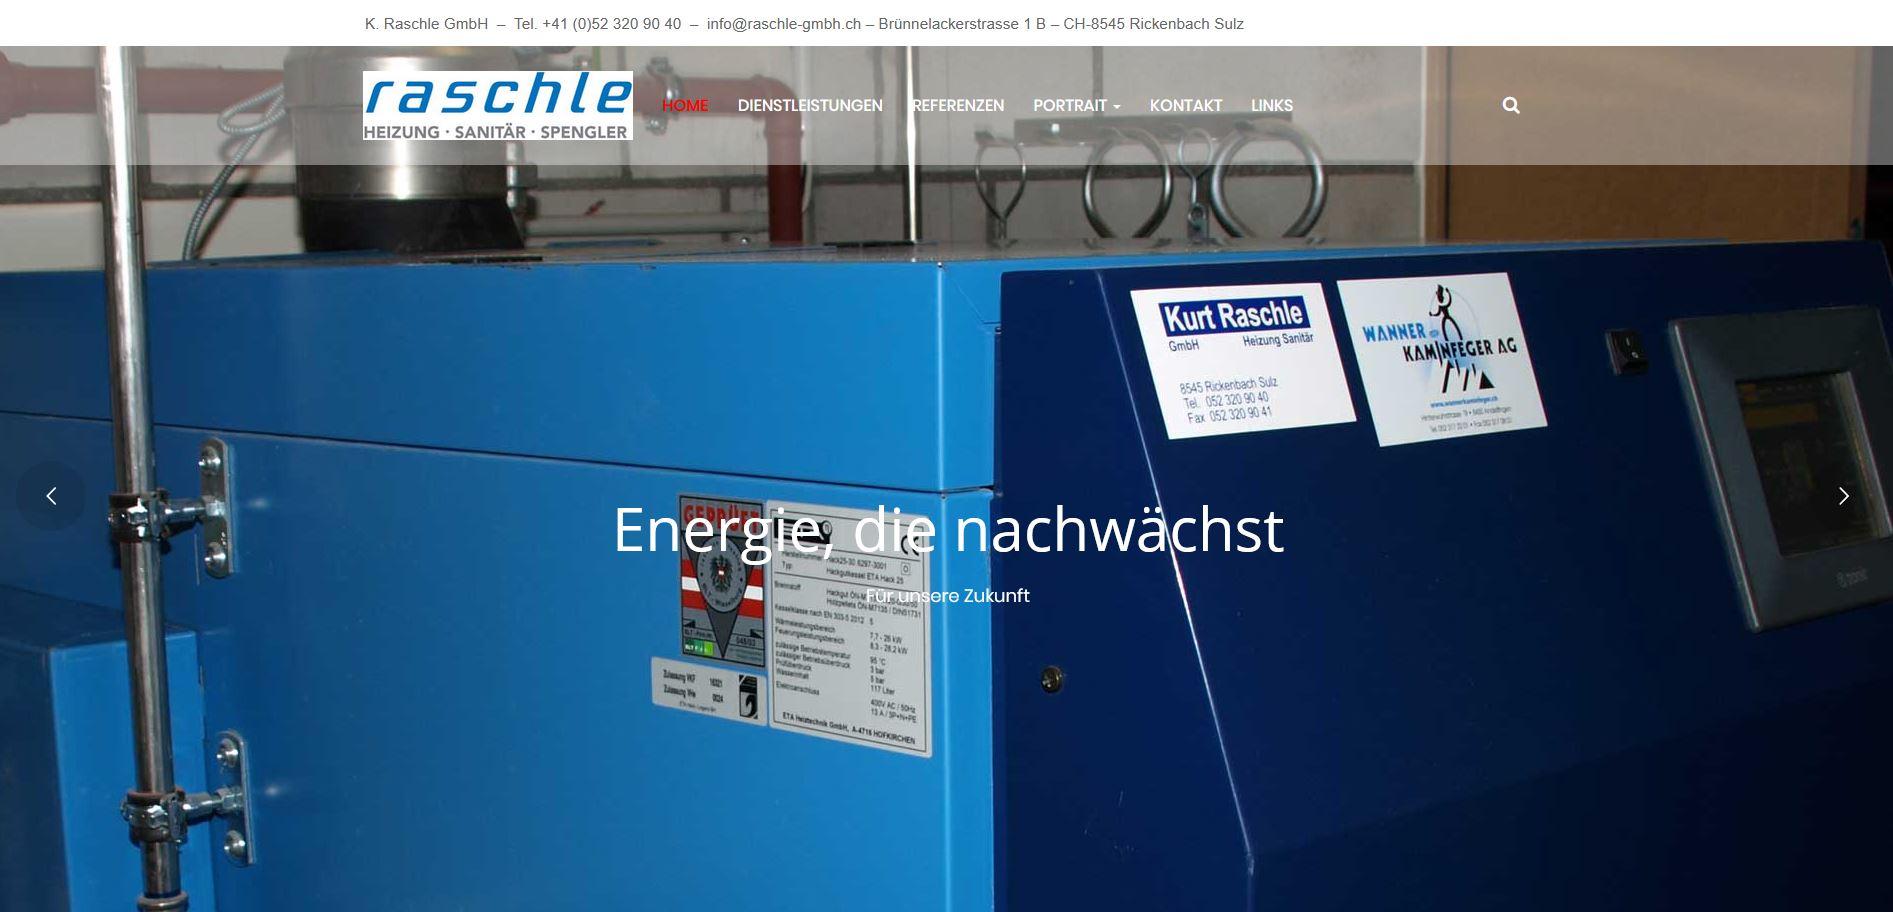 raschle-haustechnik.ch